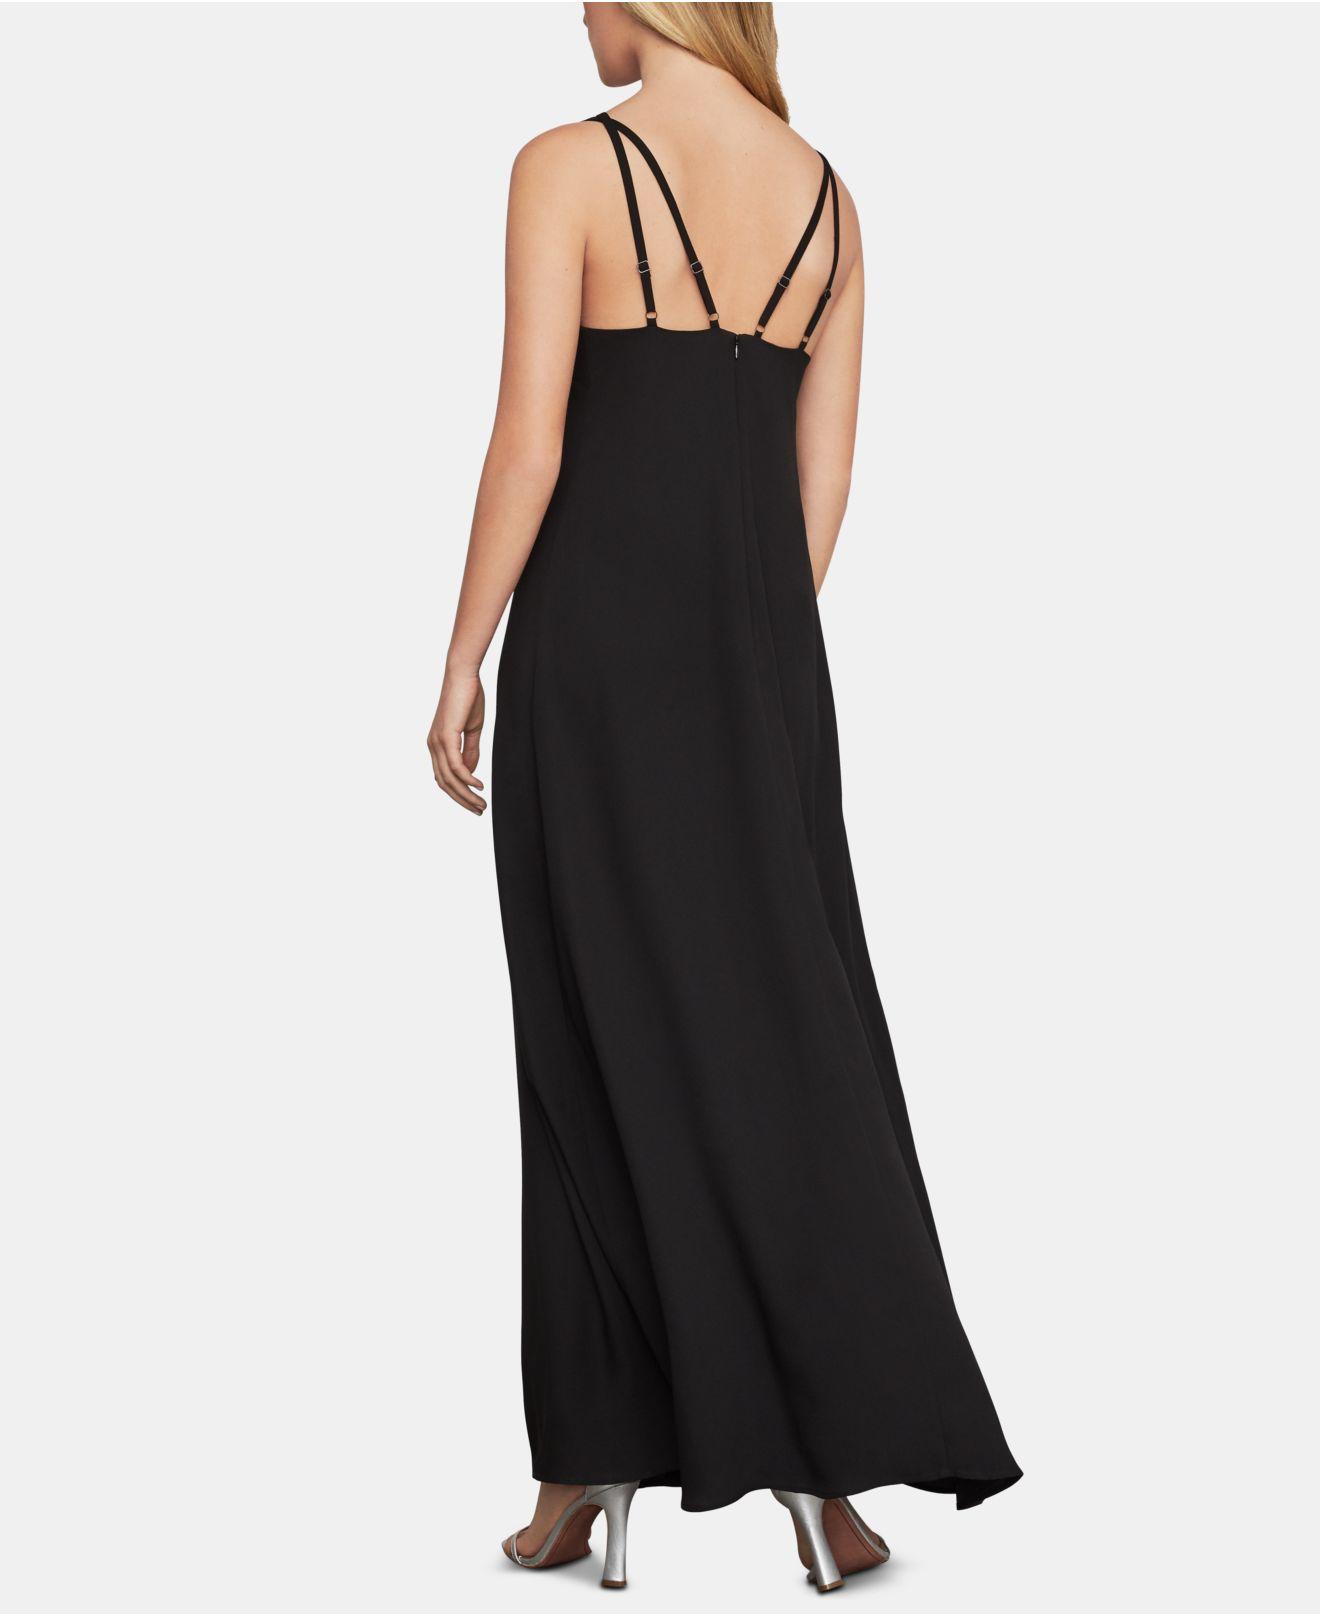 75acdec57 Source:https://www.lyst.com/clothing/bcbgmaxazria-bcbg-strappy-cutout-maxi- dress-2/